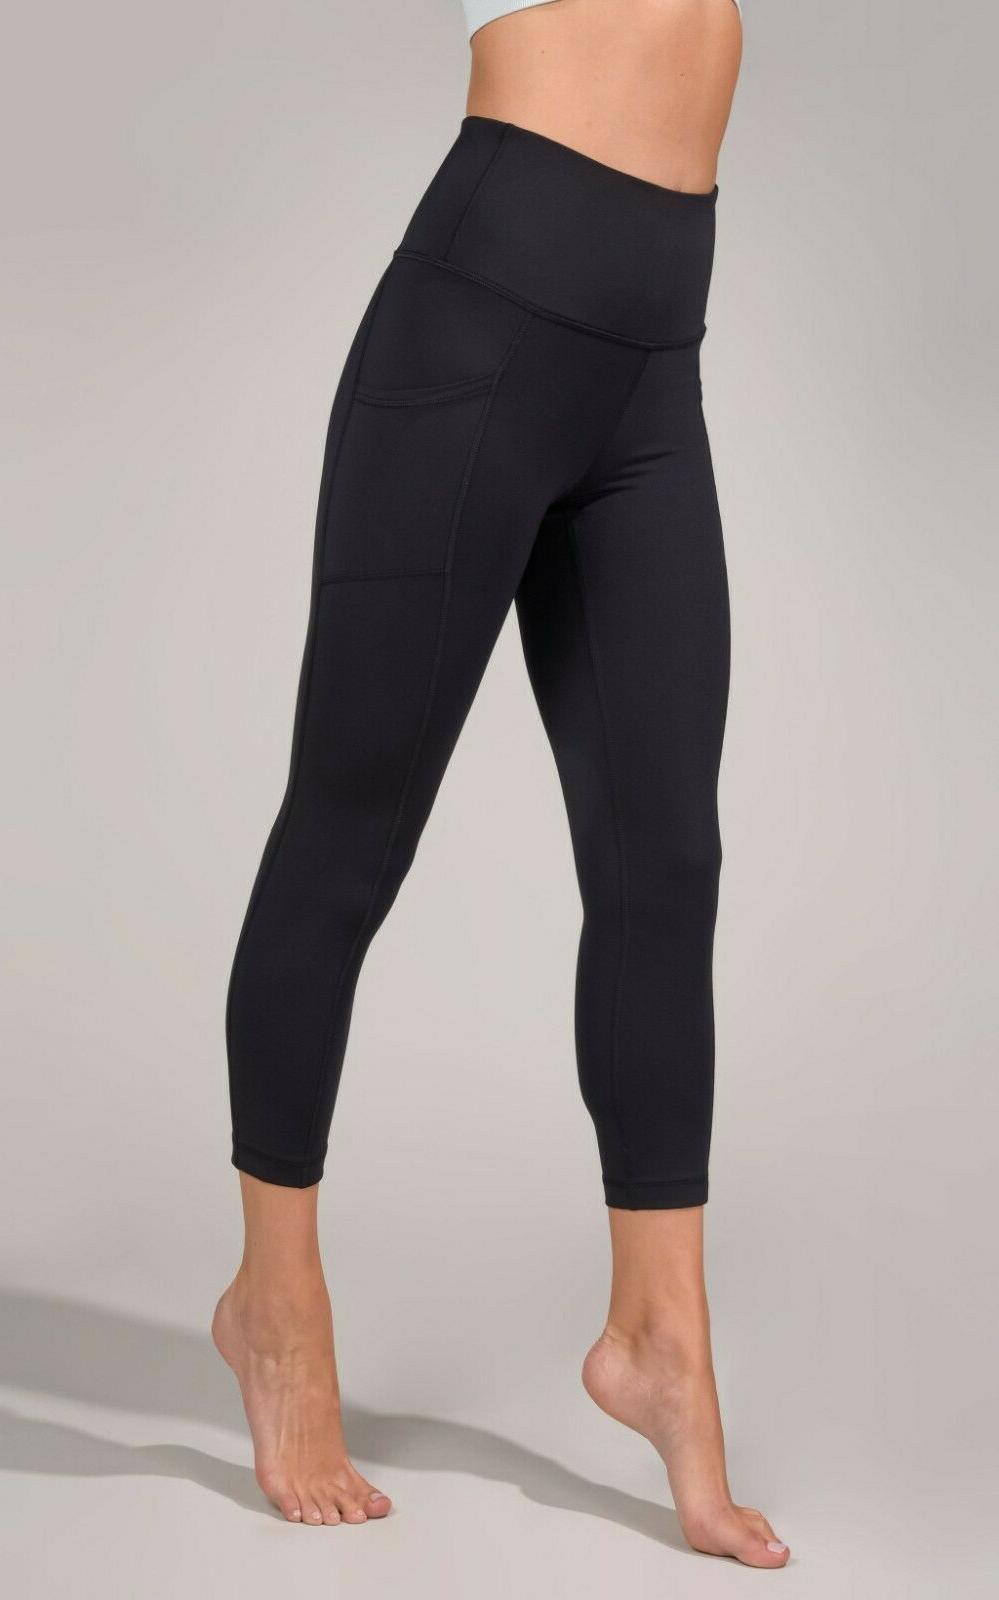 NEW Degree Reflex High Pocket Capri Leggings Pants